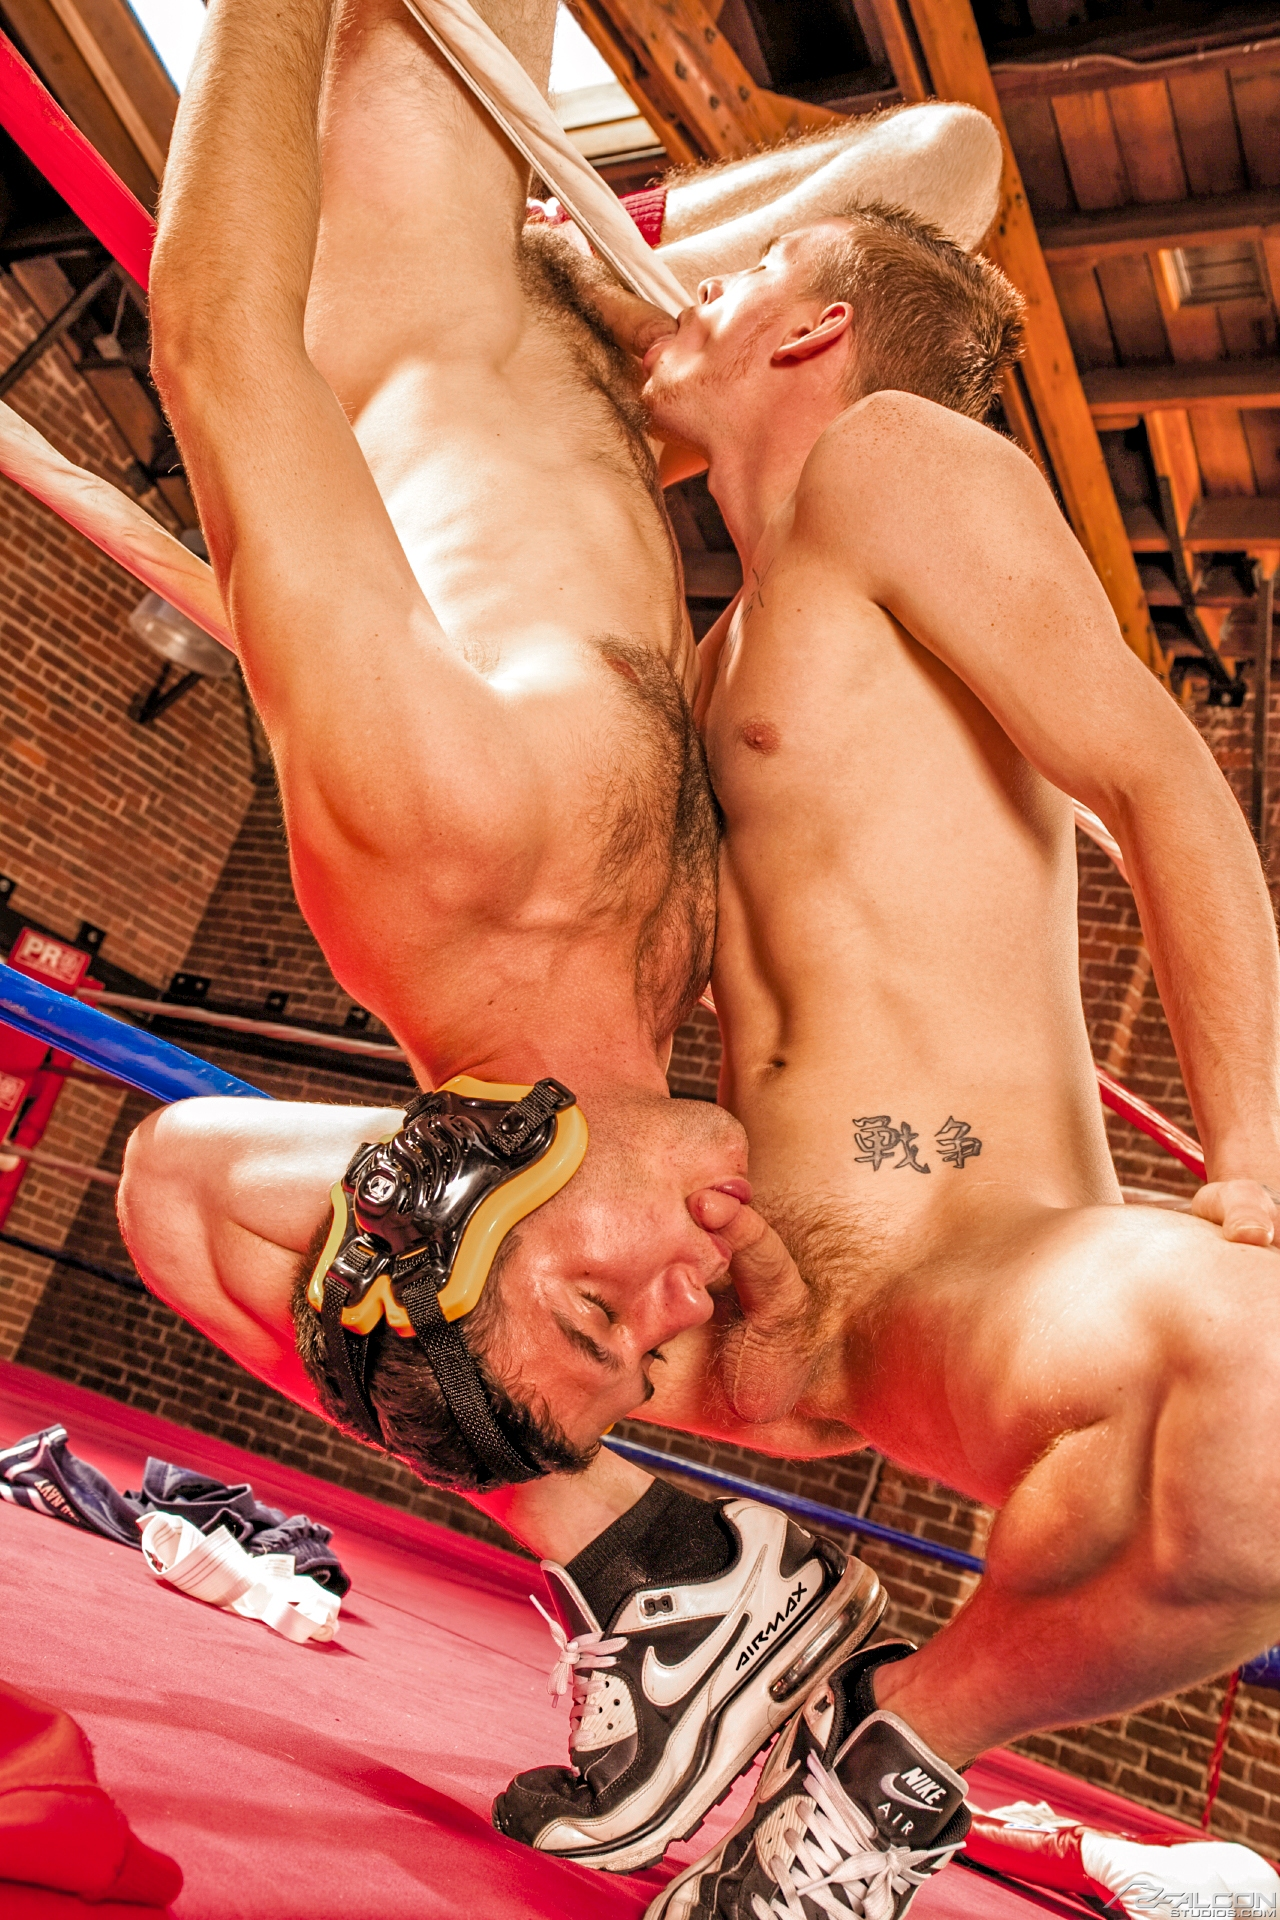 Gay Scene Starring Two Horny Wrestlers